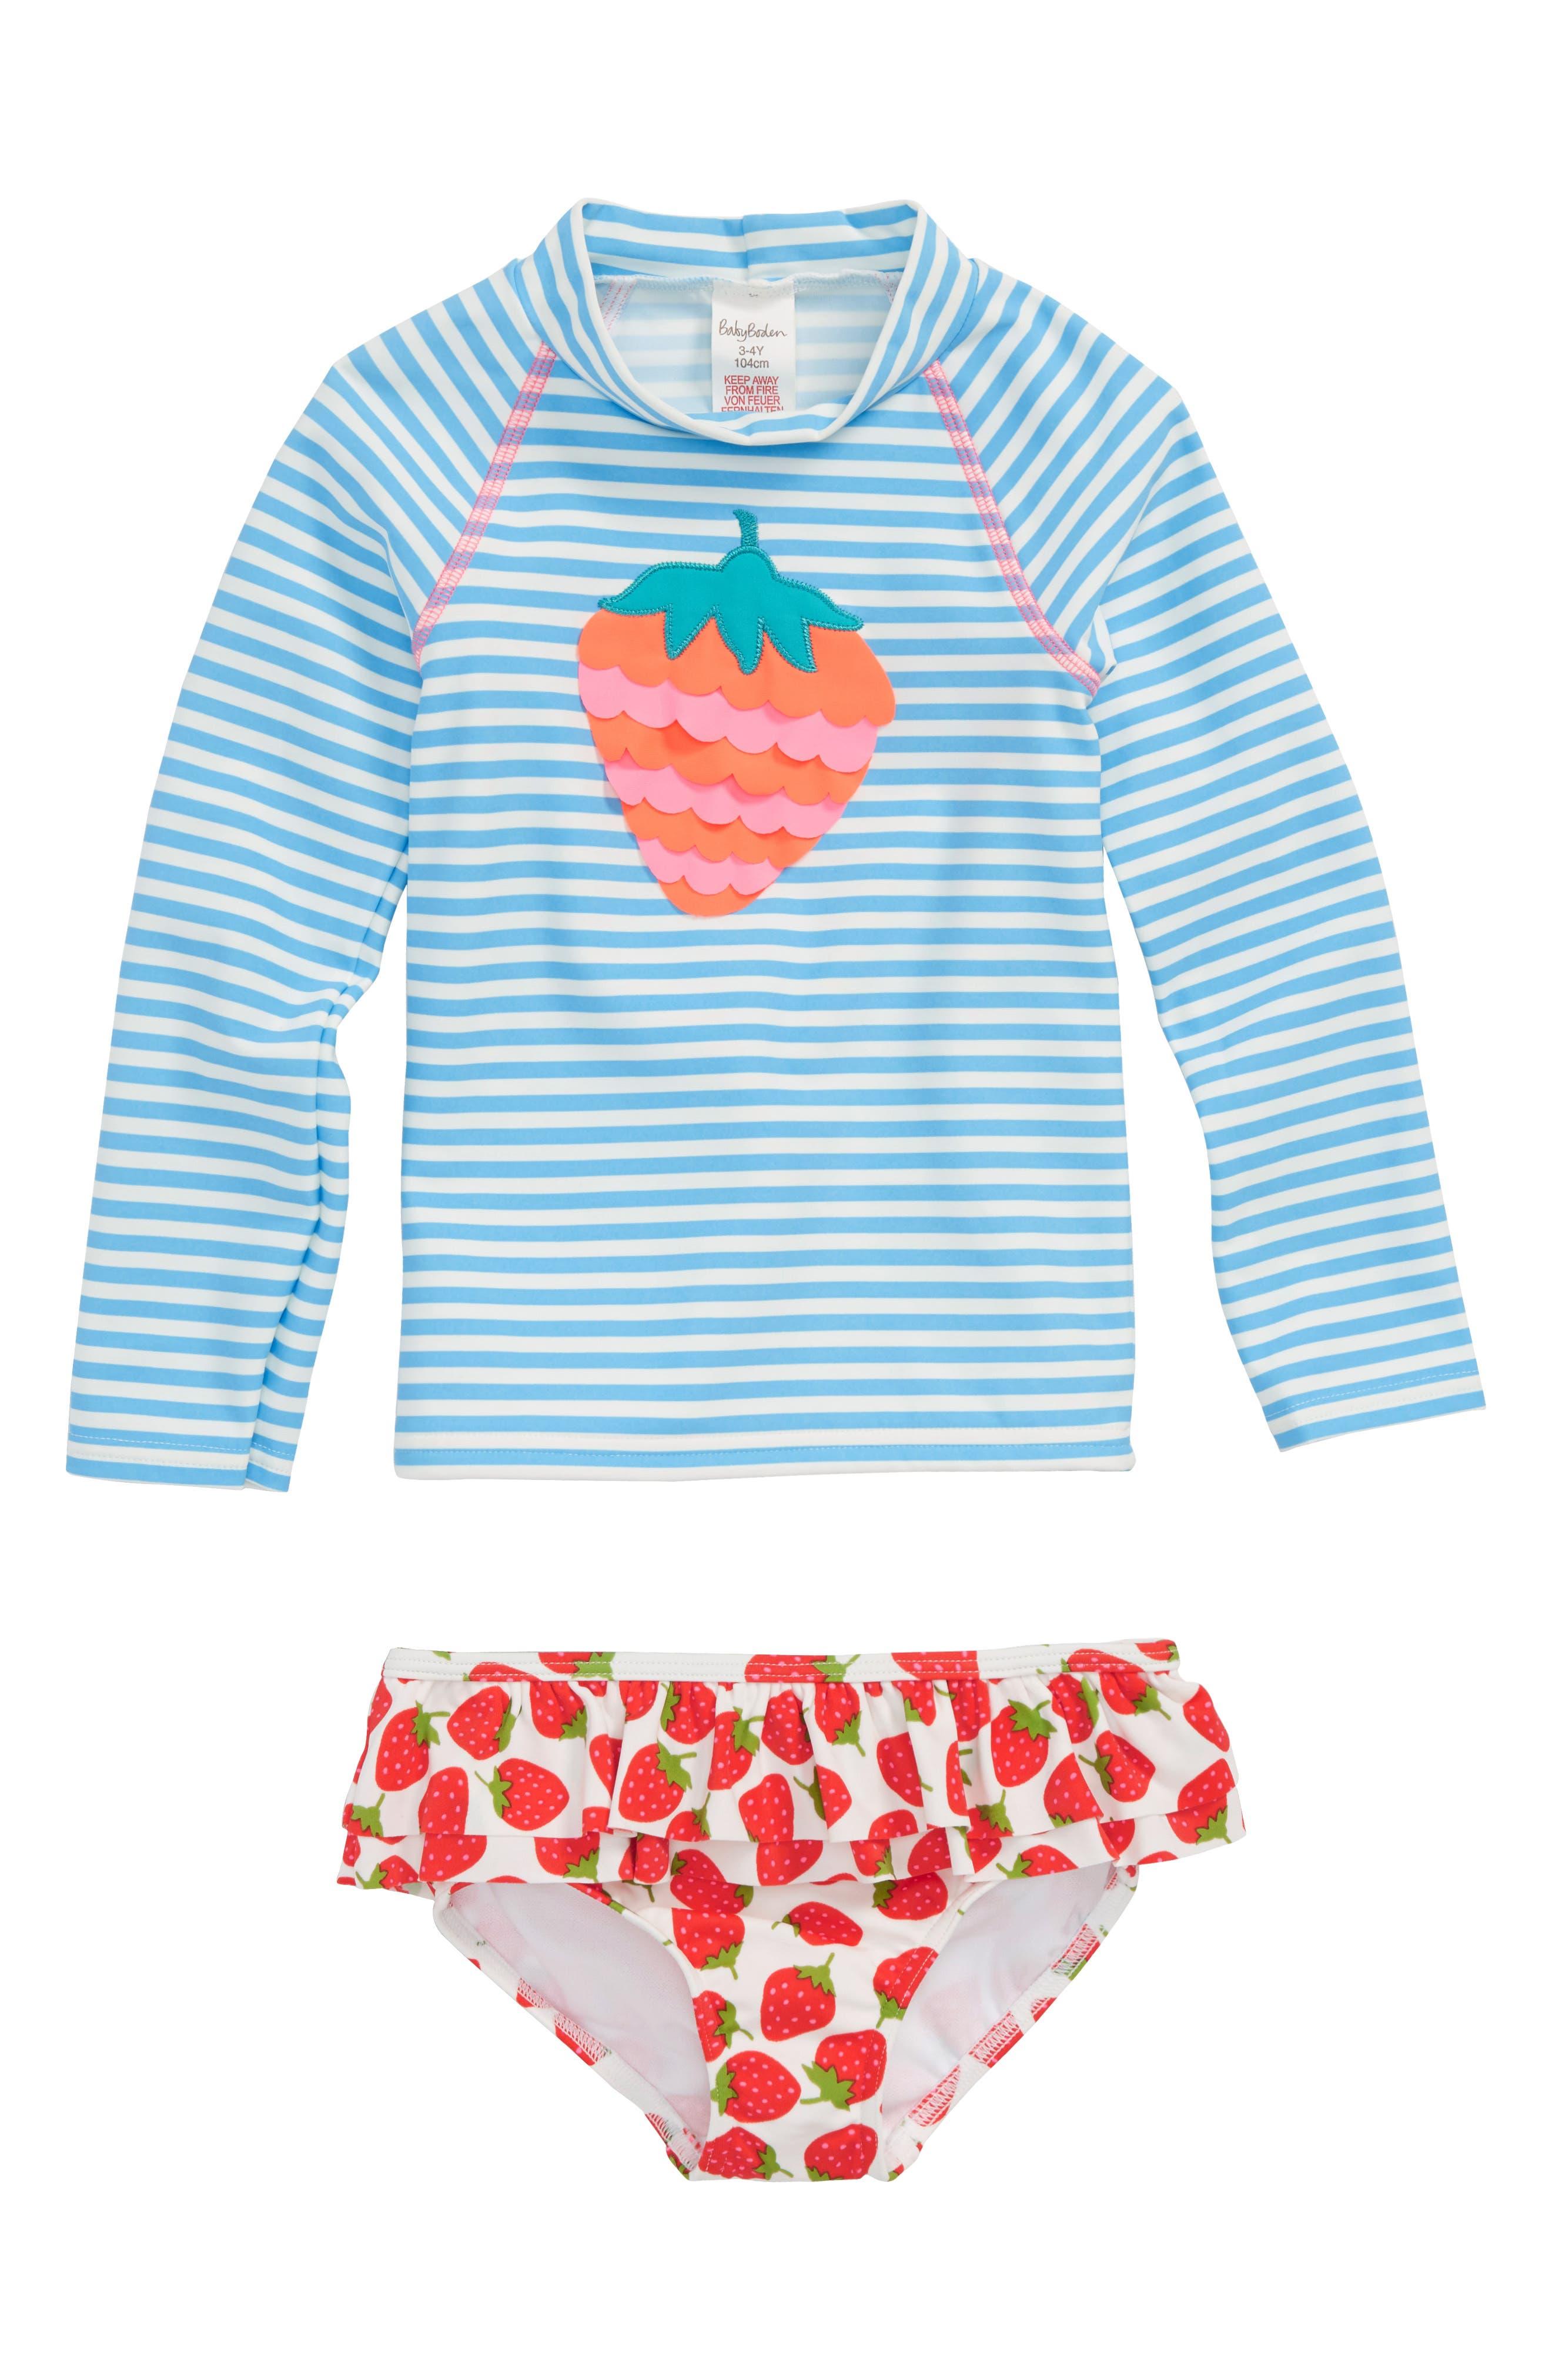 Two-Piece Rashguard Swimsuit,                             Main thumbnail 1, color,                             Candy Blue/ Ivory Stripe